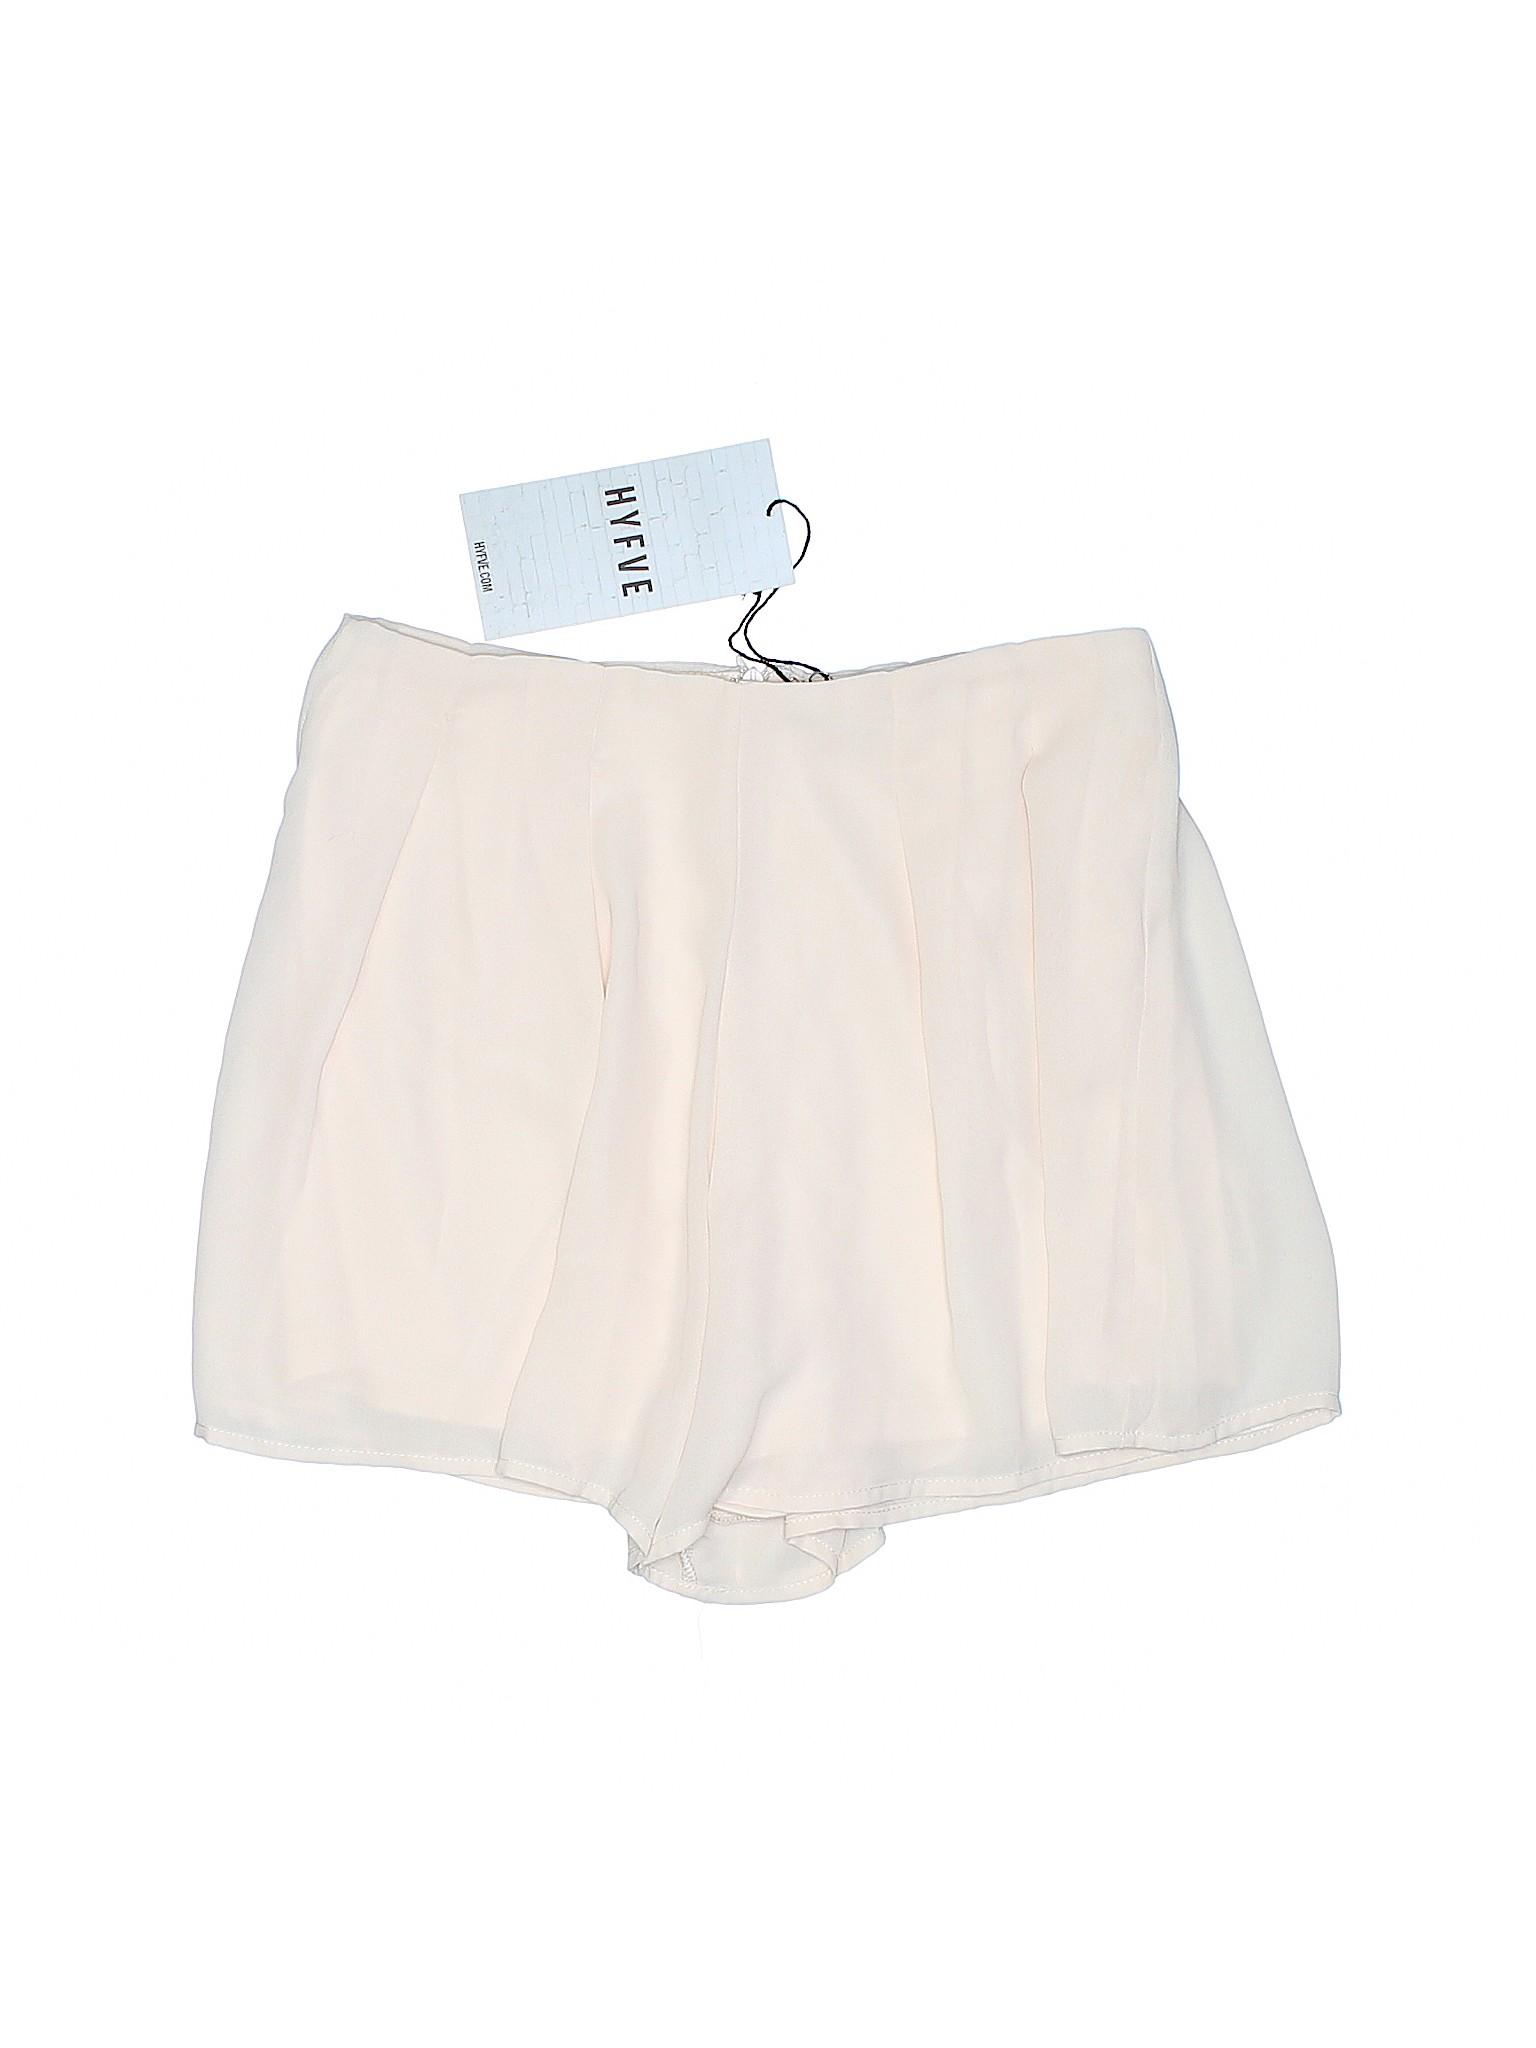 Boutique Boutique Hyfve Shorts Hyfve Hyfve Shorts Boutique Hyfve Shorts Boutique Shorts UqI57w4